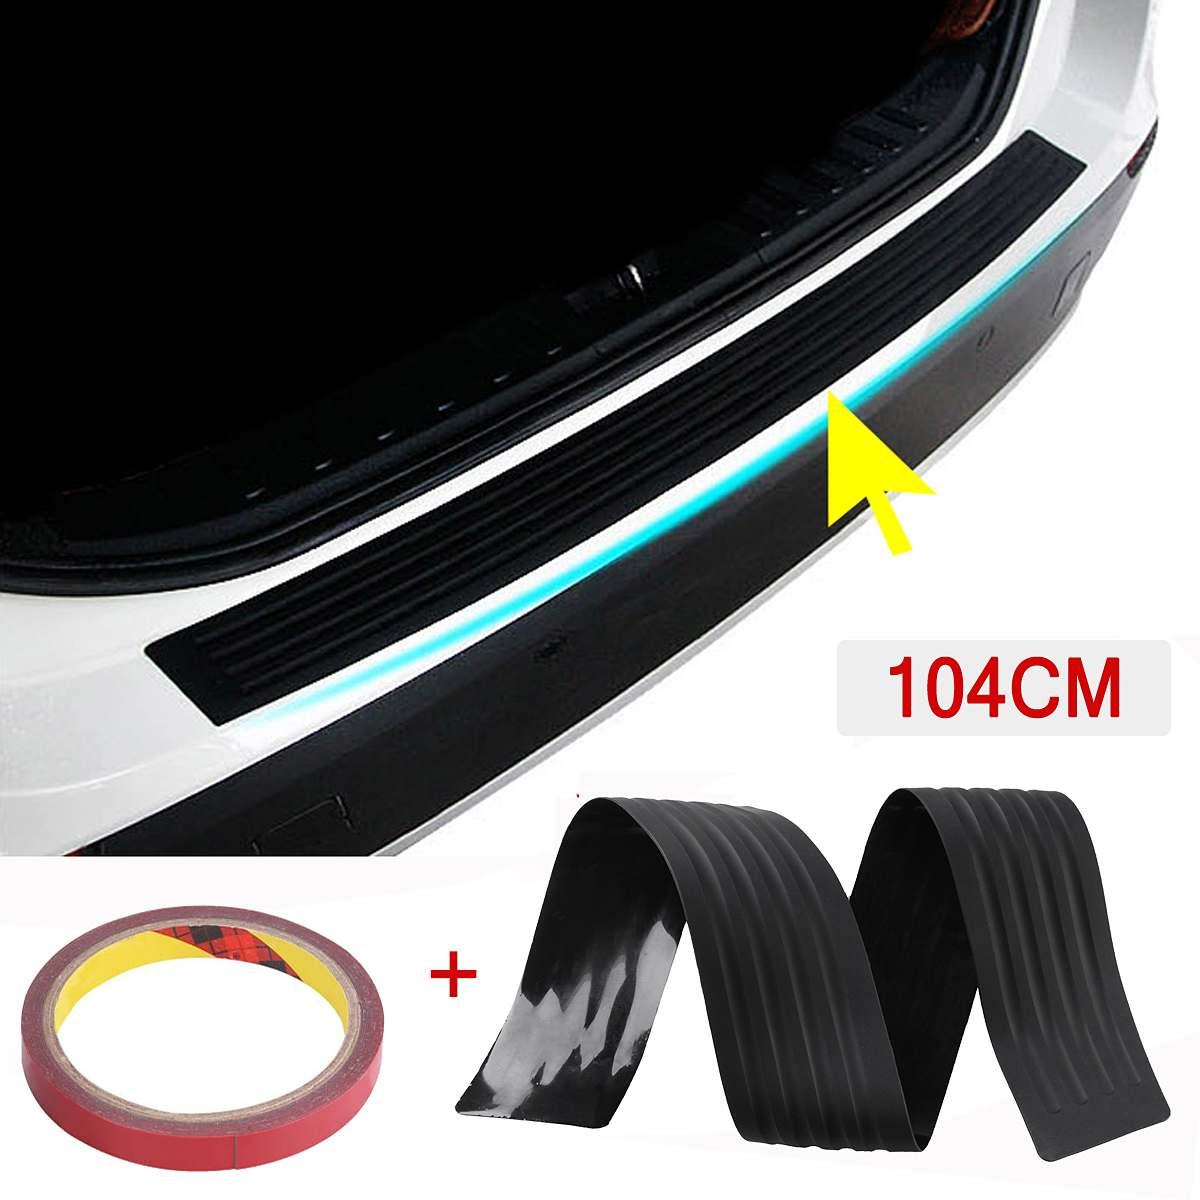 Car Truck Universal Rear Bumper Sill//Protector Plate Rubber Cover Guard Trim Pad